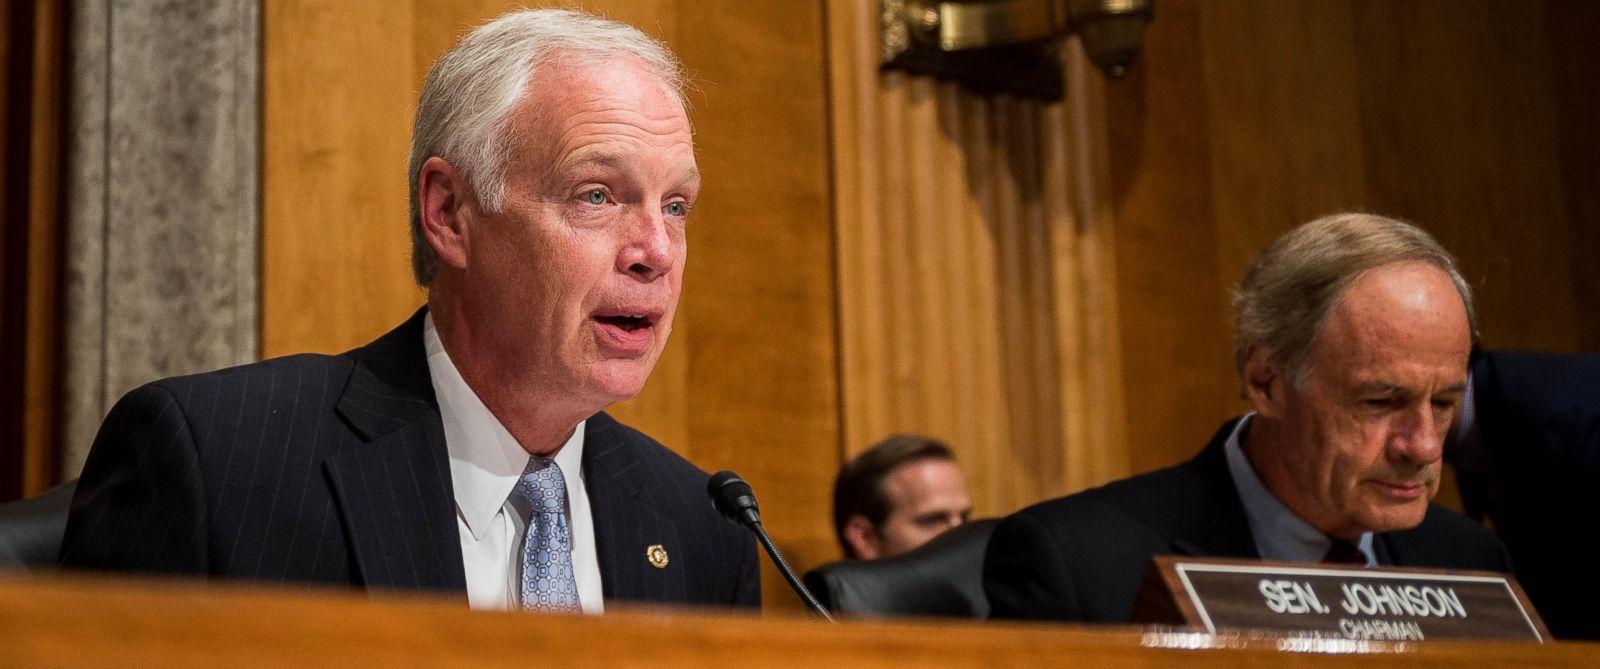 news politics national trumps cabinet picks practicing mock confirmation hearings